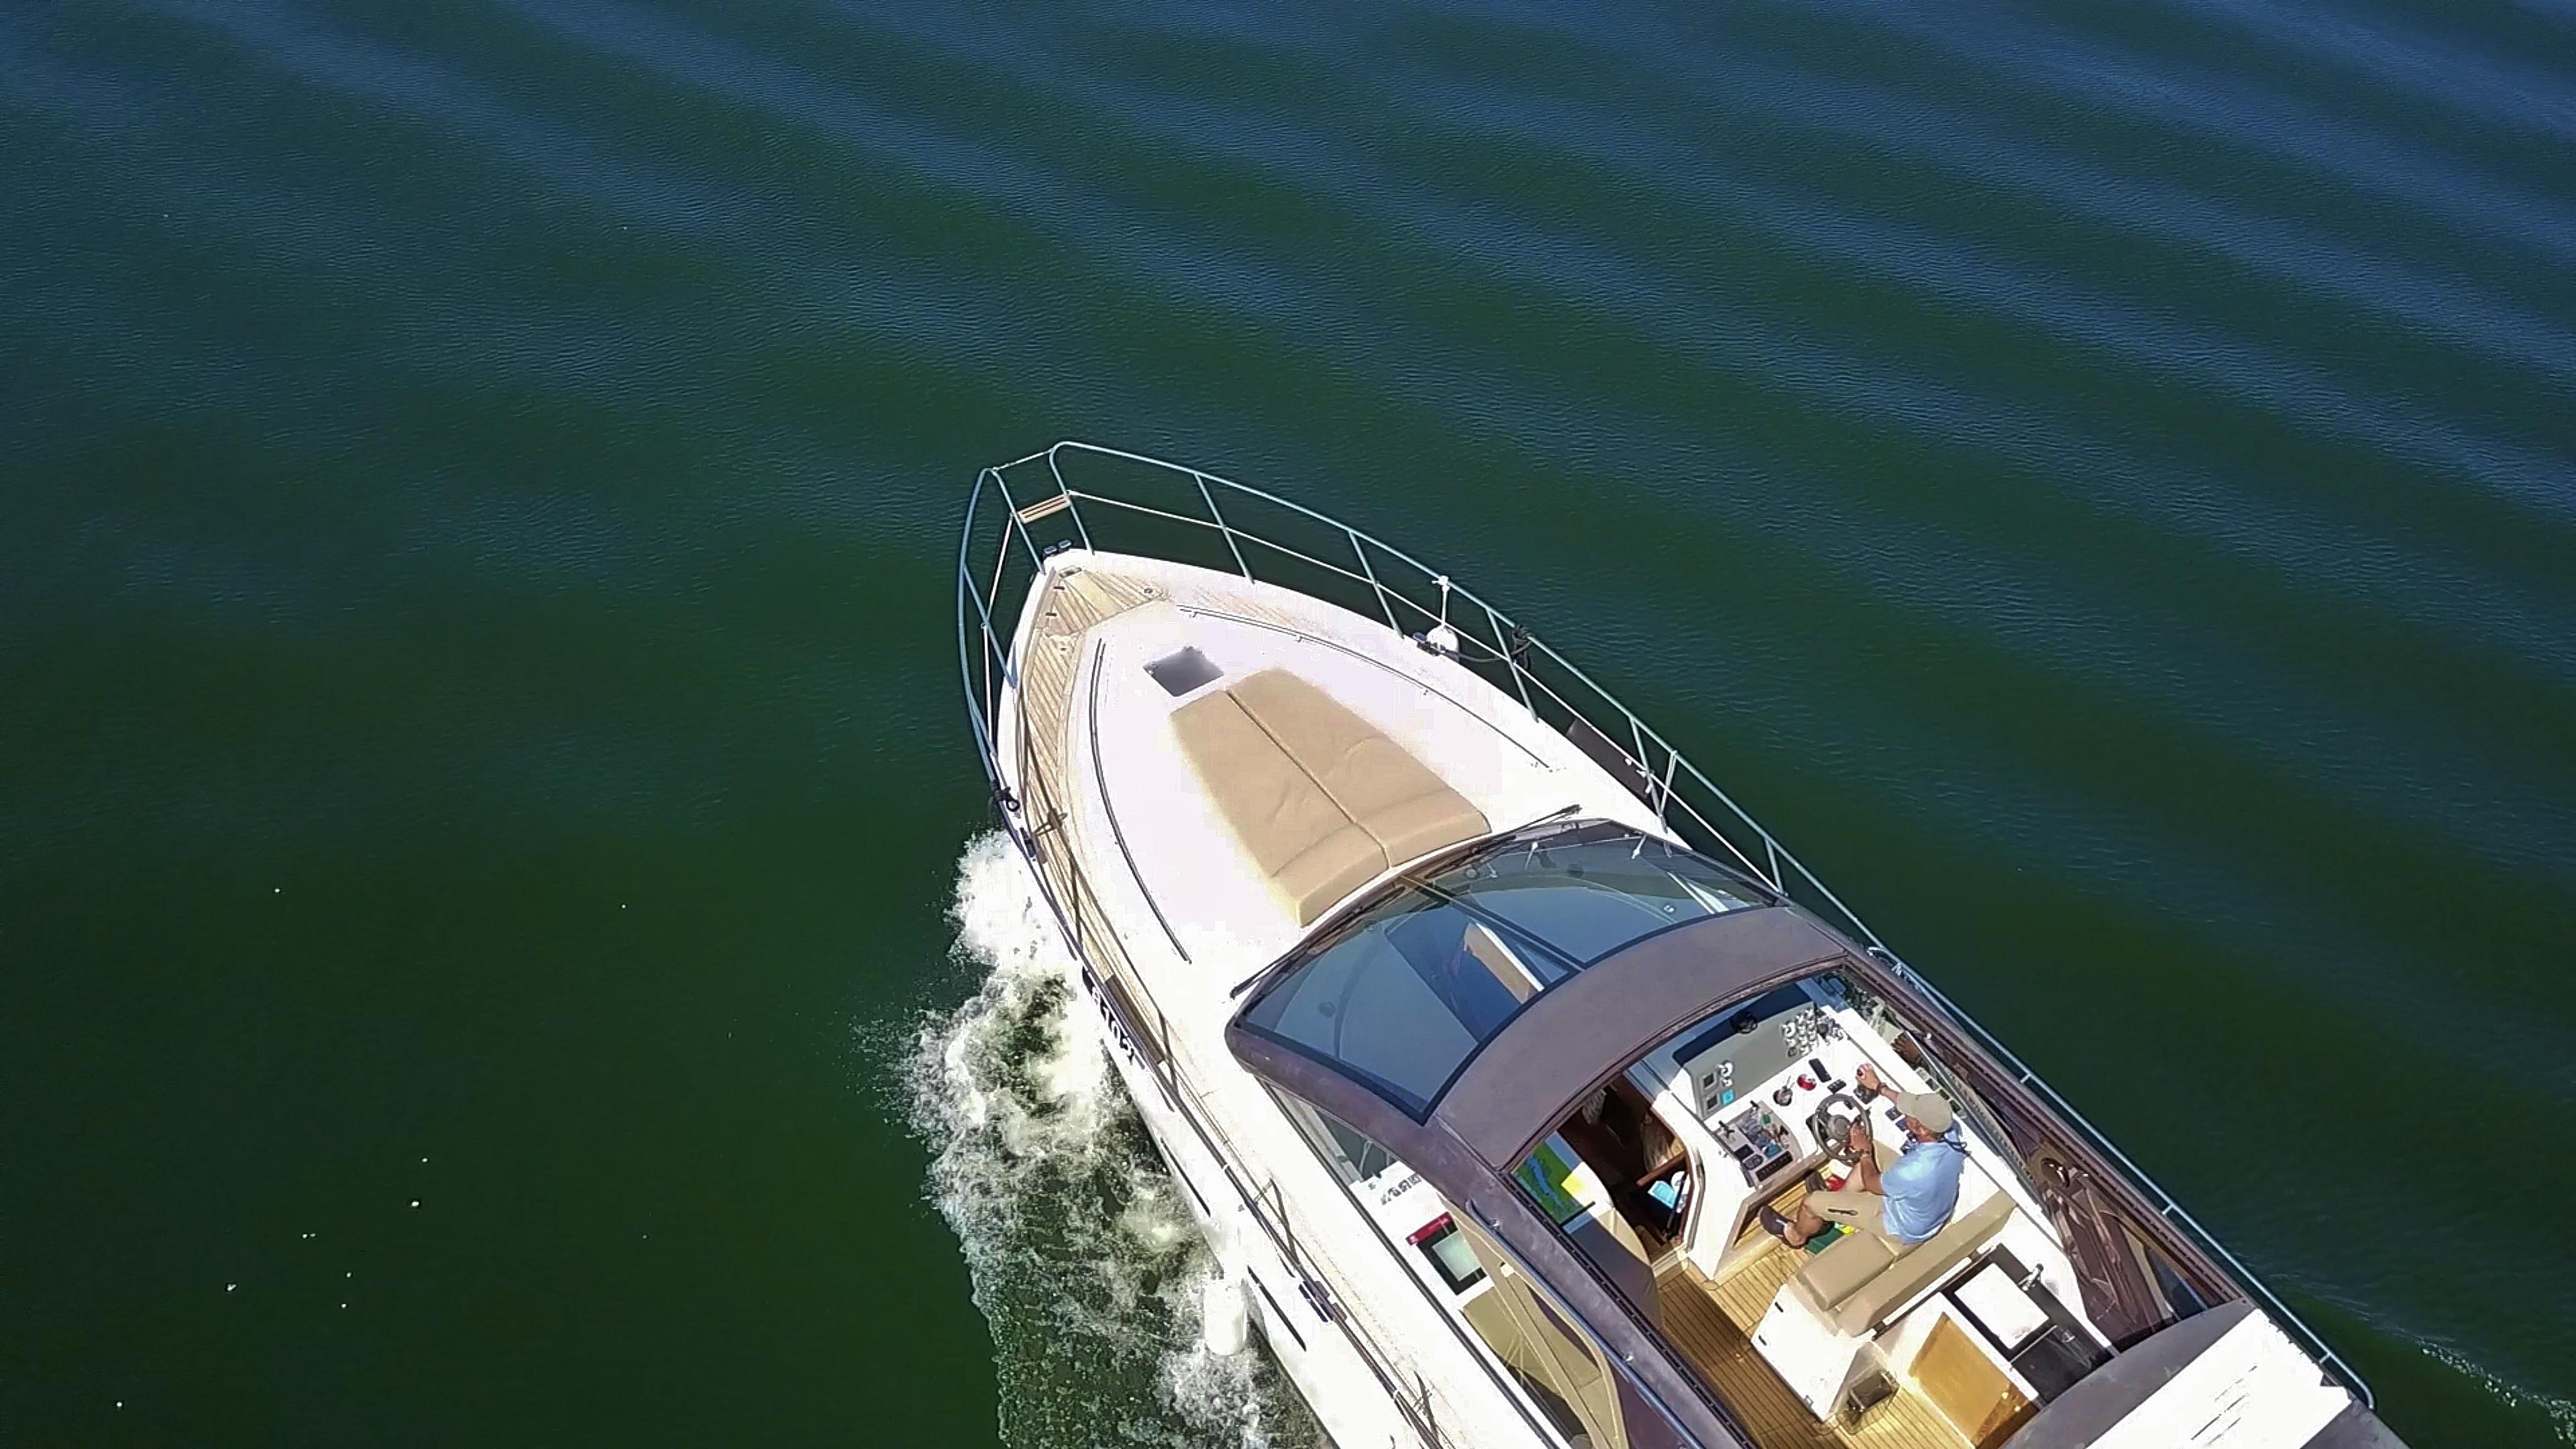 My Lake Cruise